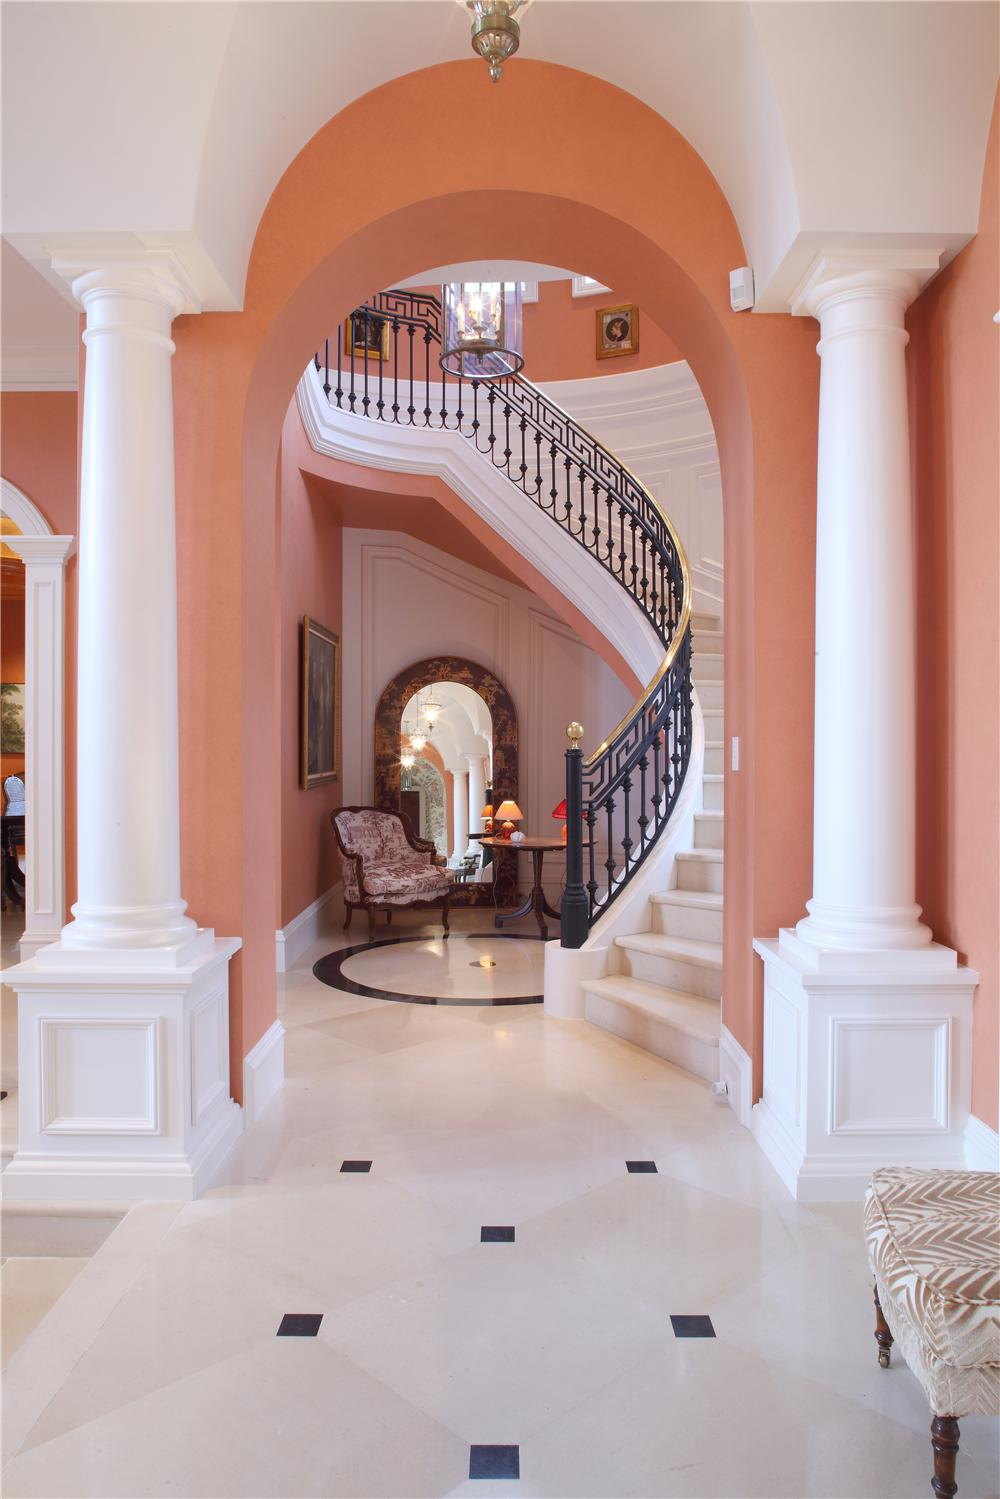 Luxury House Florida Palm Beach Boca Raton Le Lac 1000by